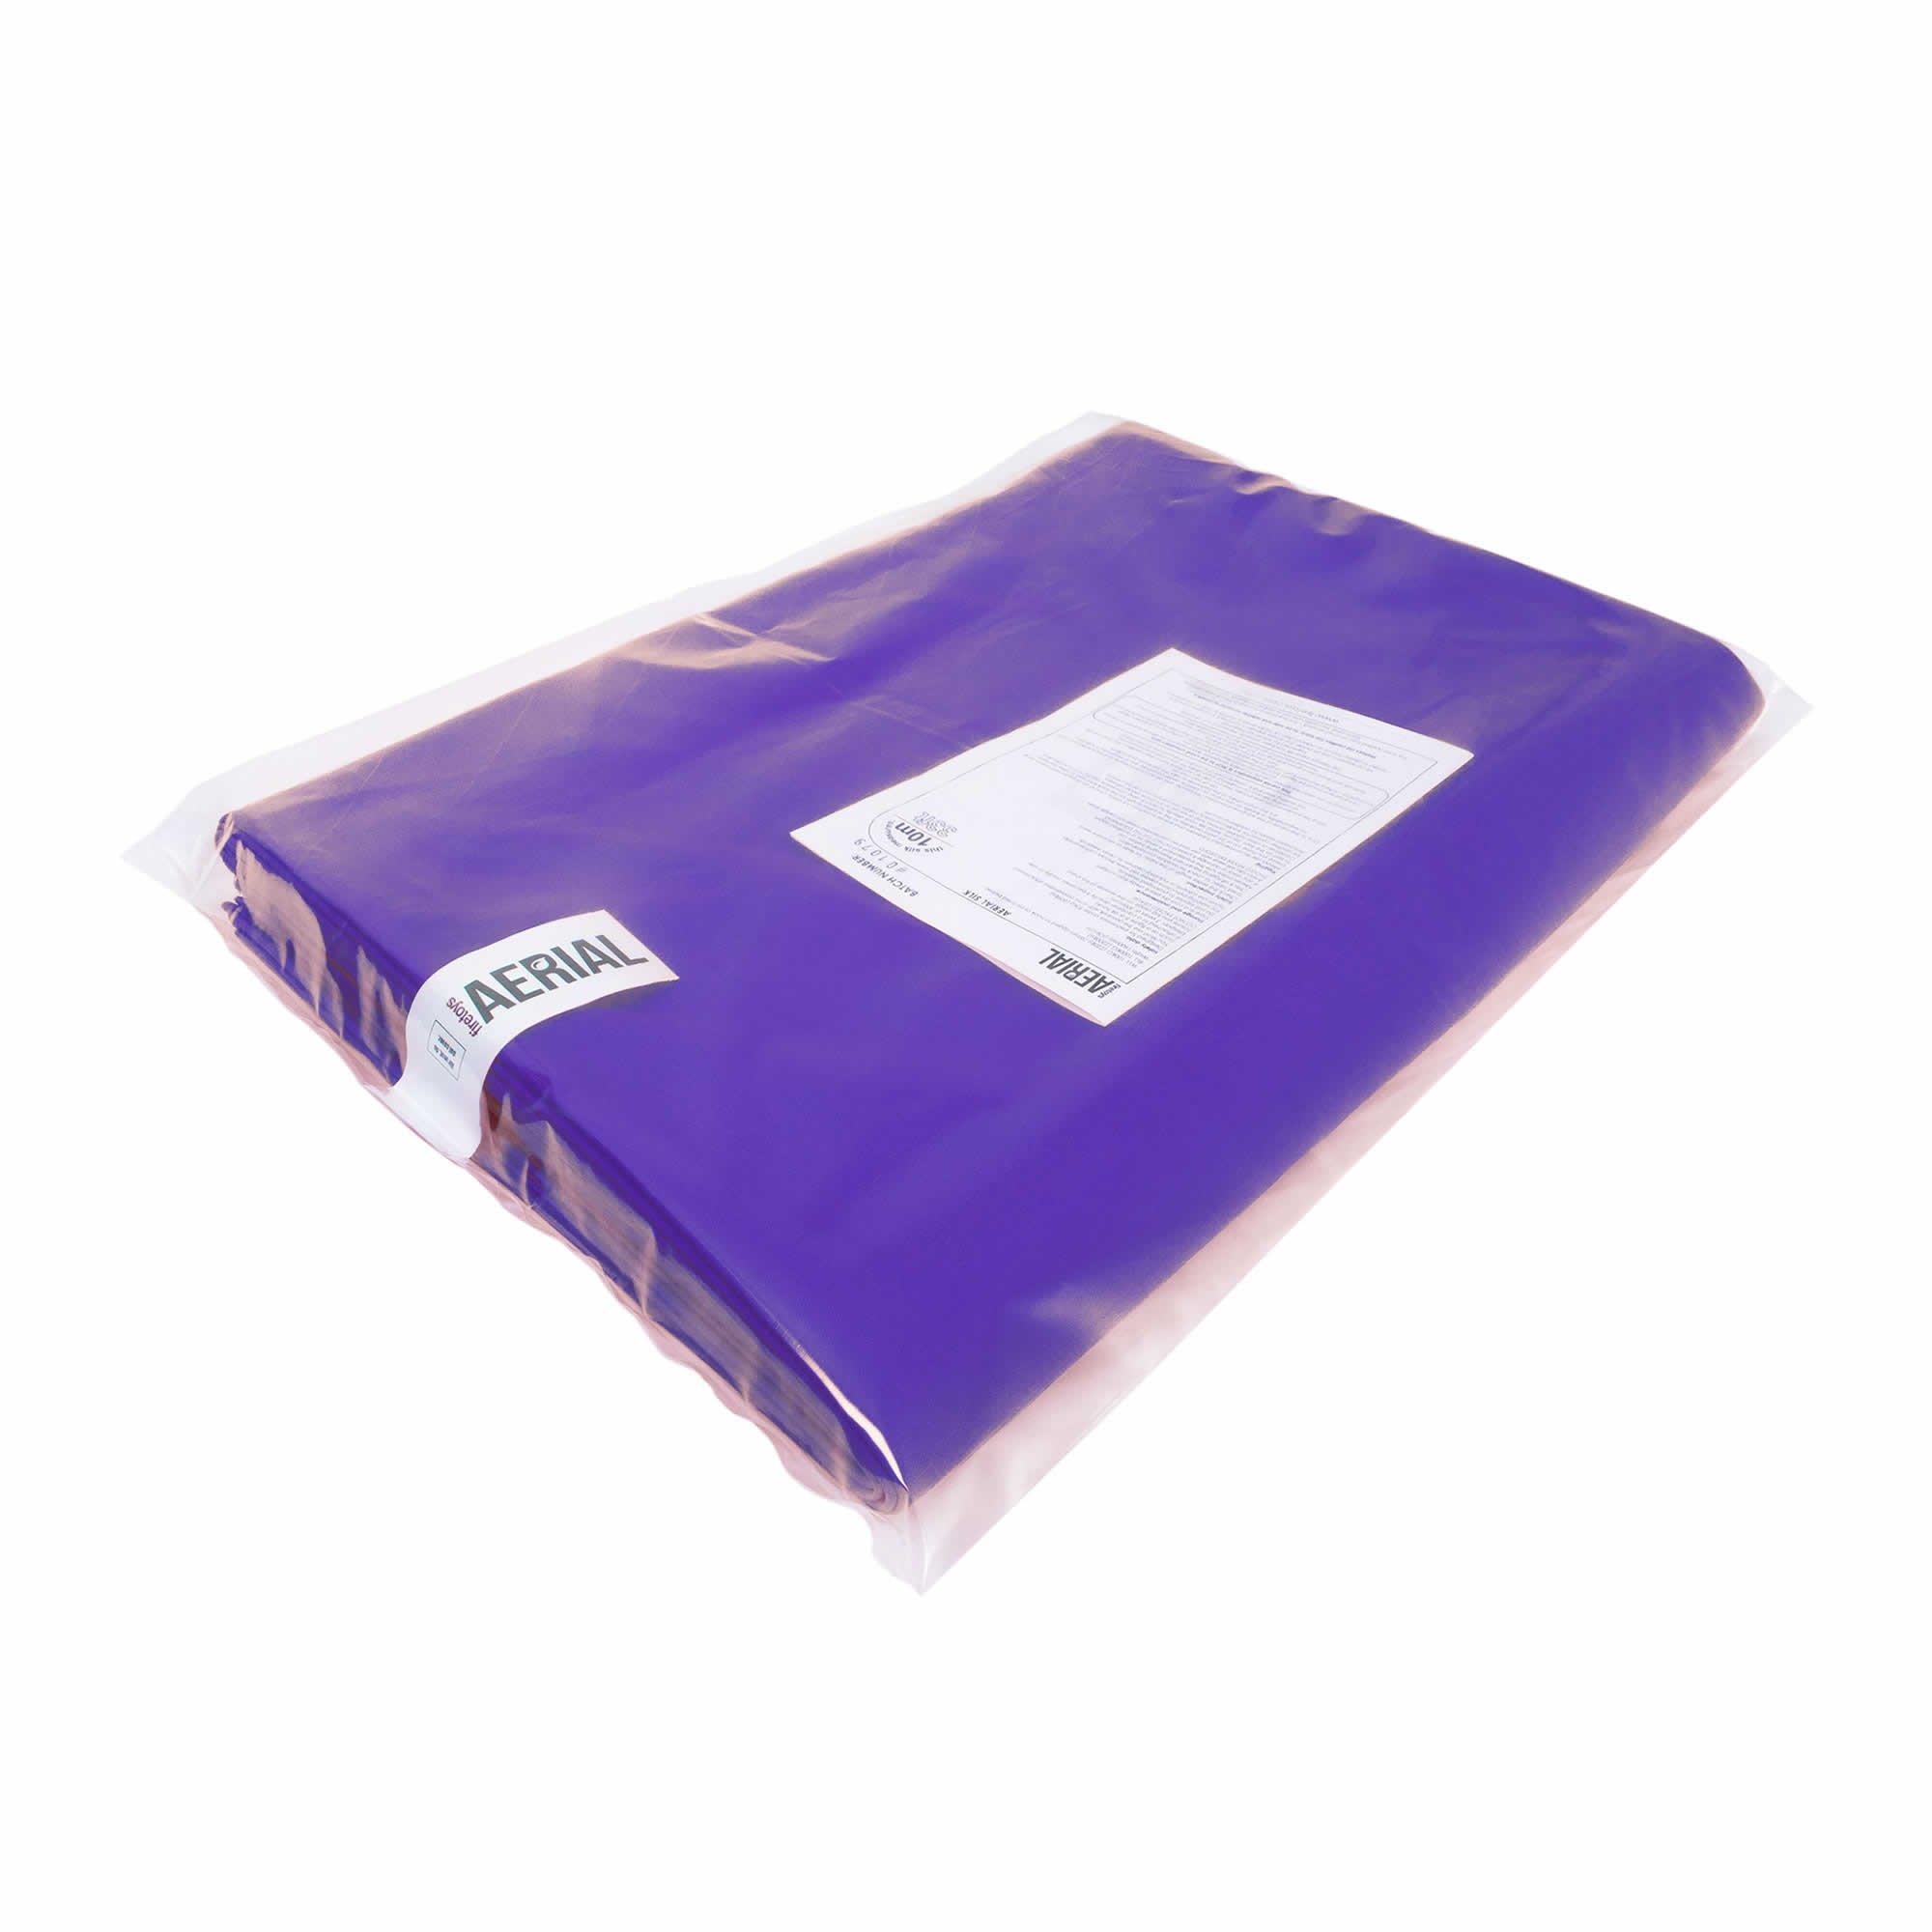 Firetoys Aerial Silk (Aerial Fabric Fabric (Aerial / Tissus) - lila-8 metres 9f67b5